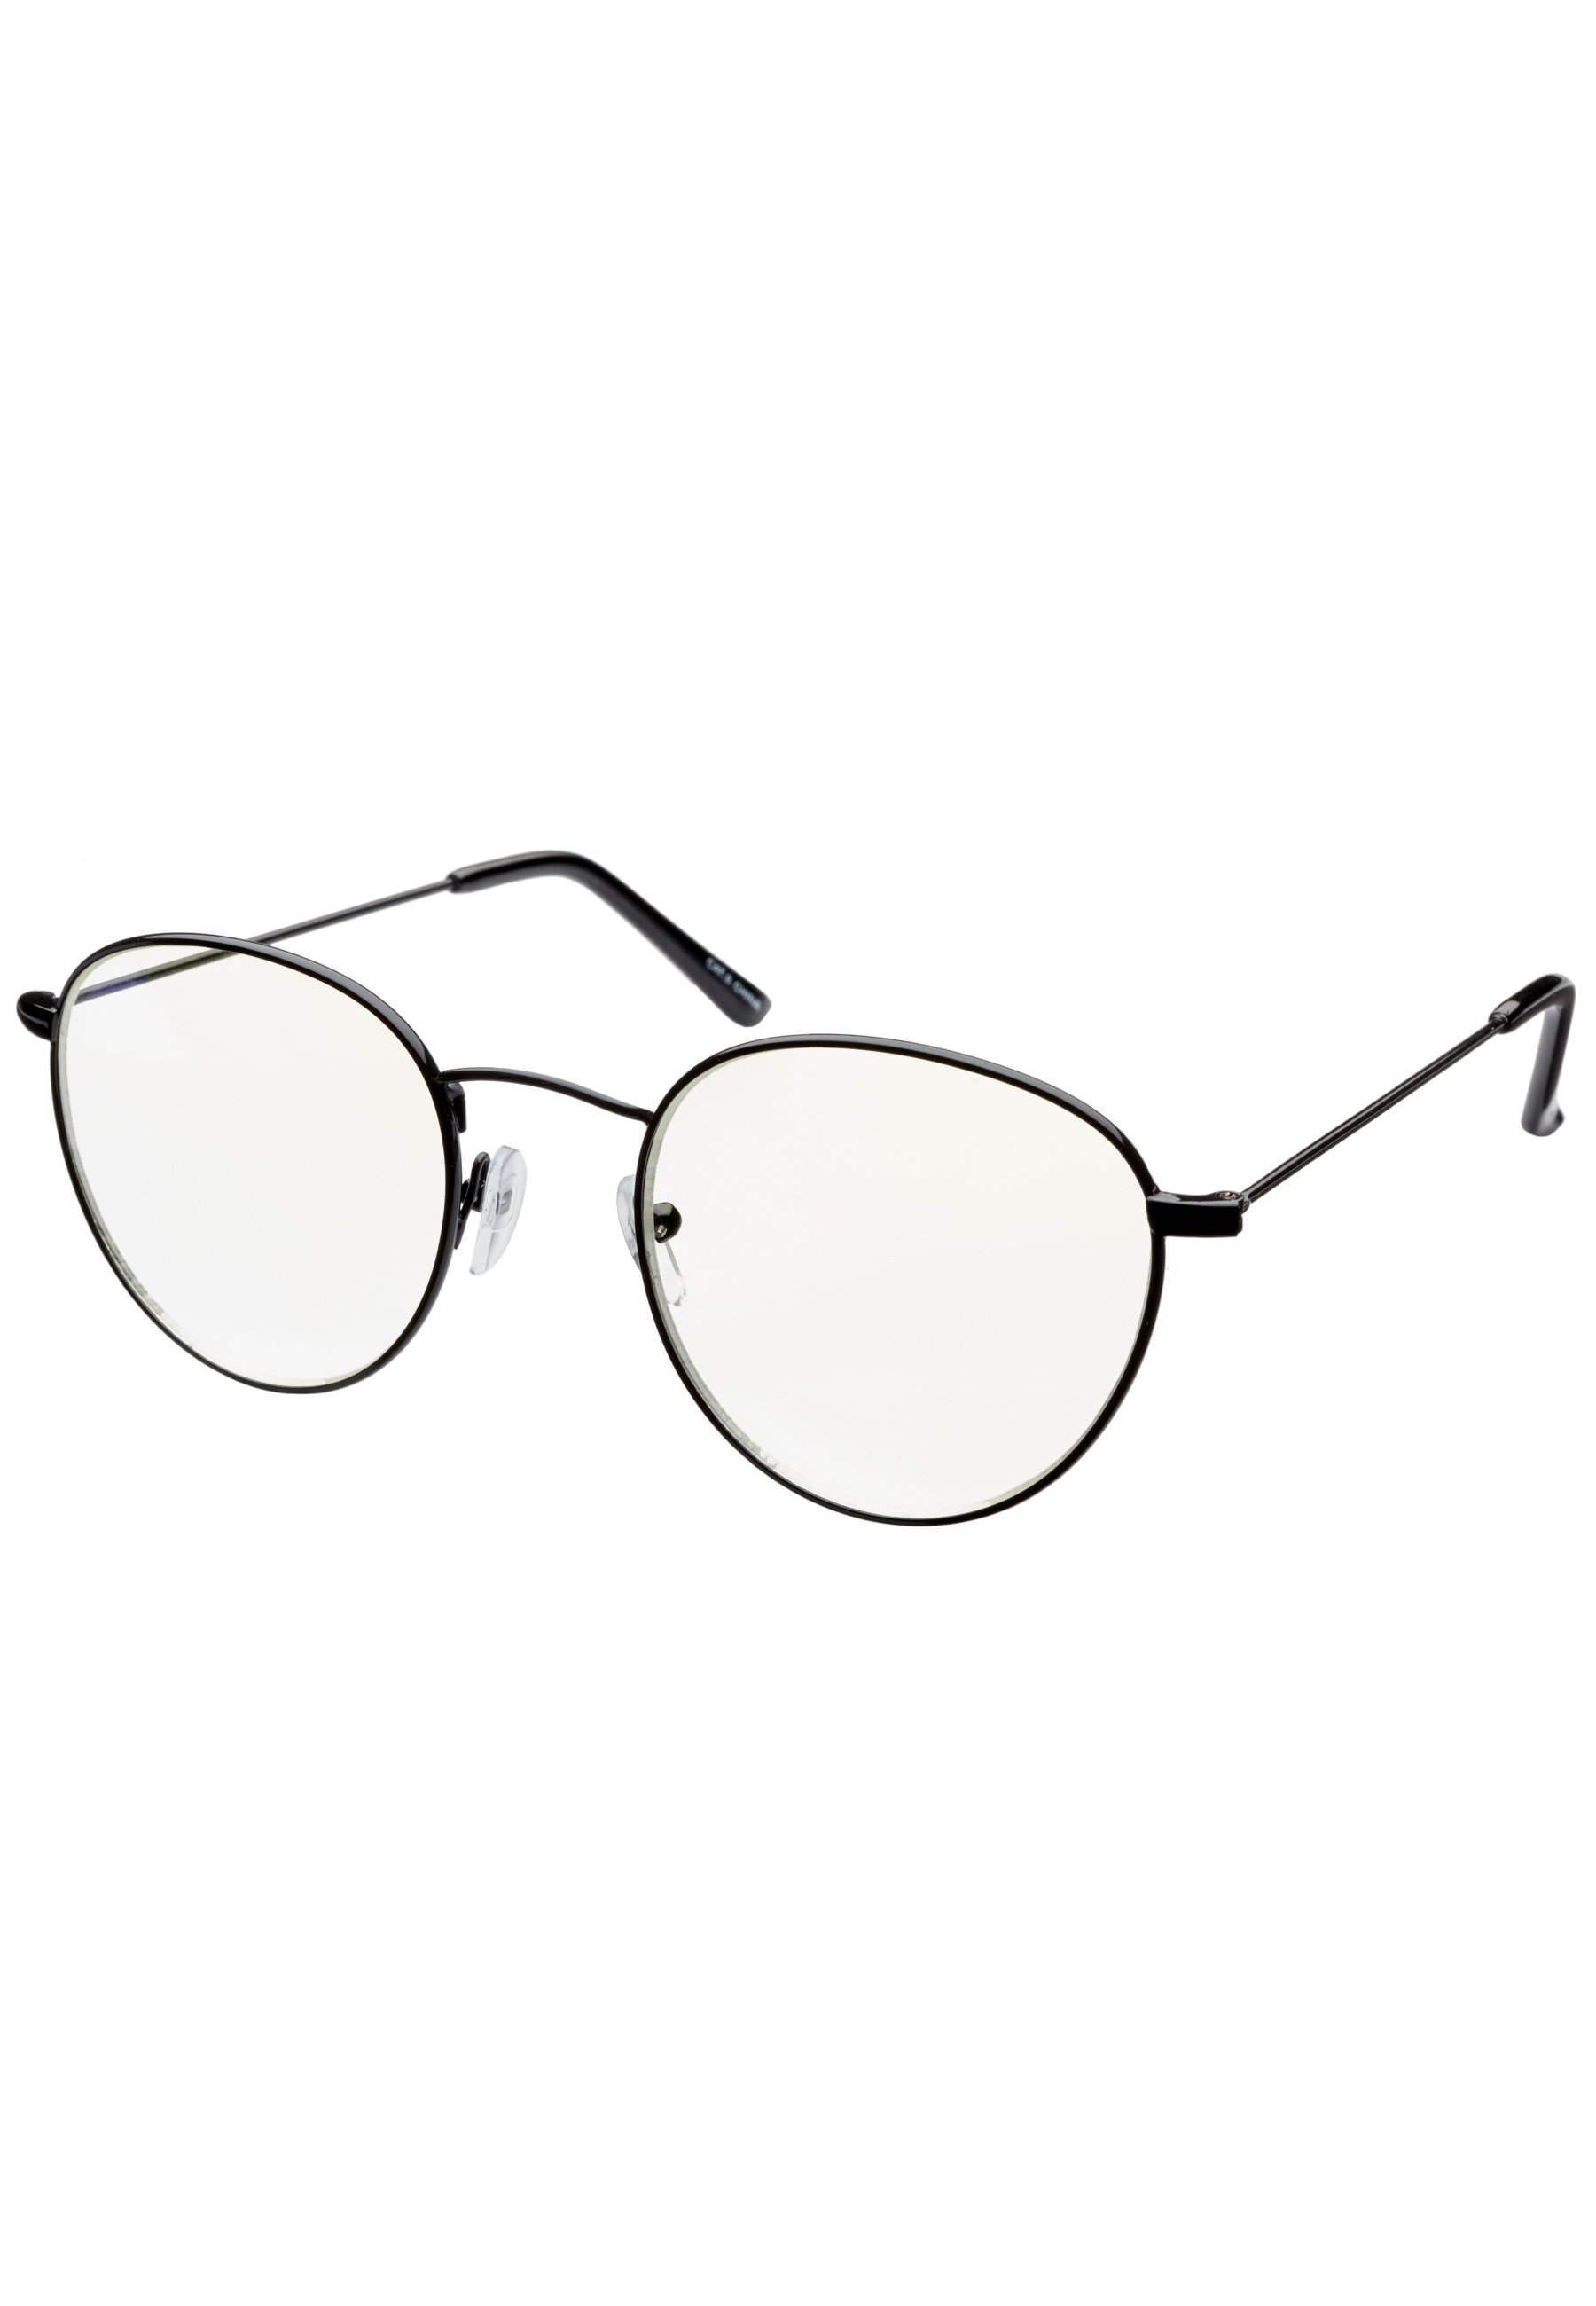 Donna VEGAS BLUE LIGHT GLASSES - Occhiali da sole